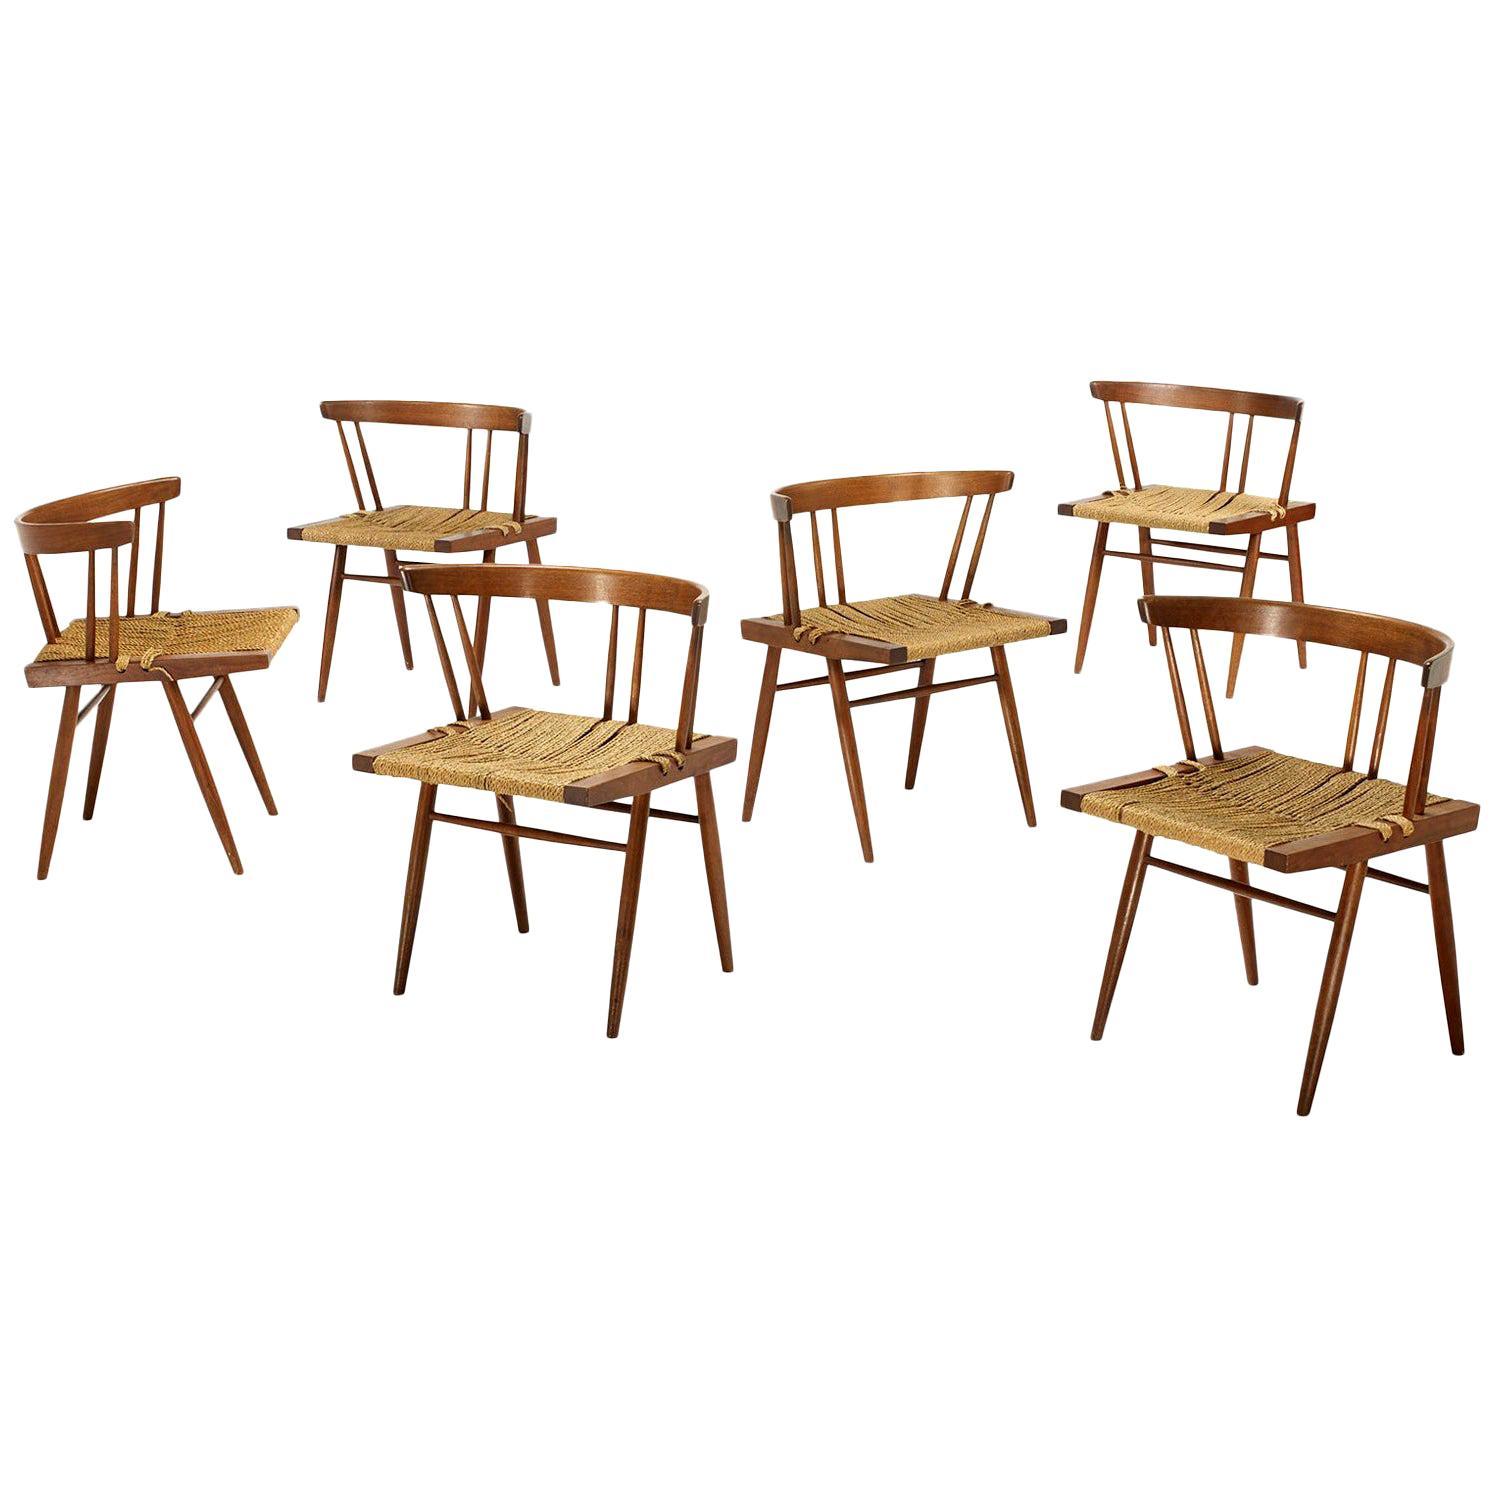 George Nakashima Grass Seat and Walnut Chairs